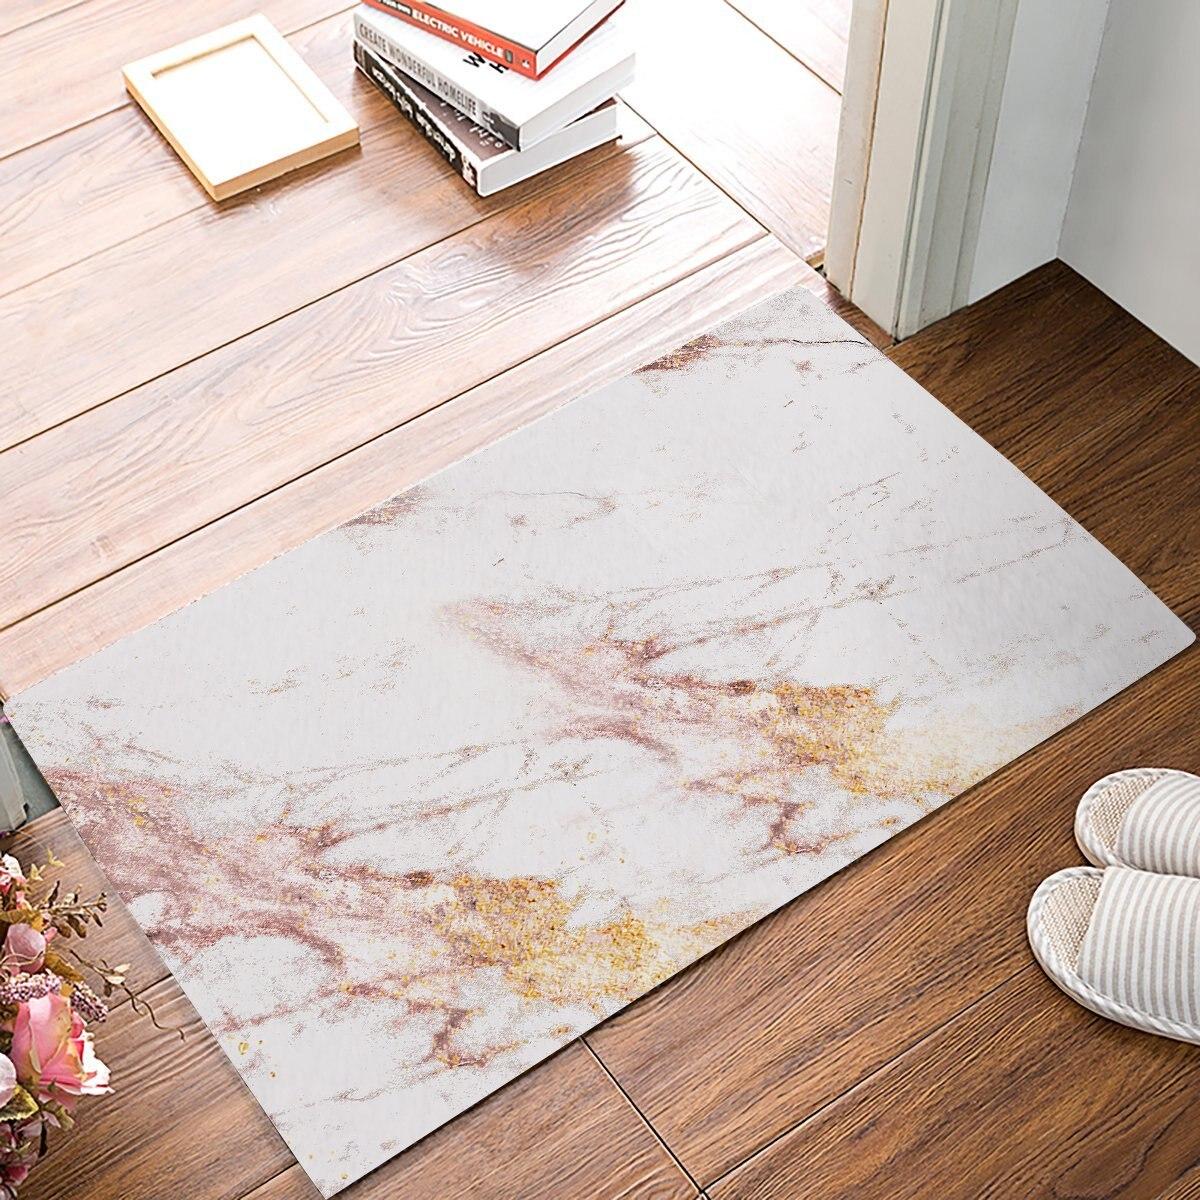 Modern Rose Gold Marble Triangle Door Mats Kitchen Floor